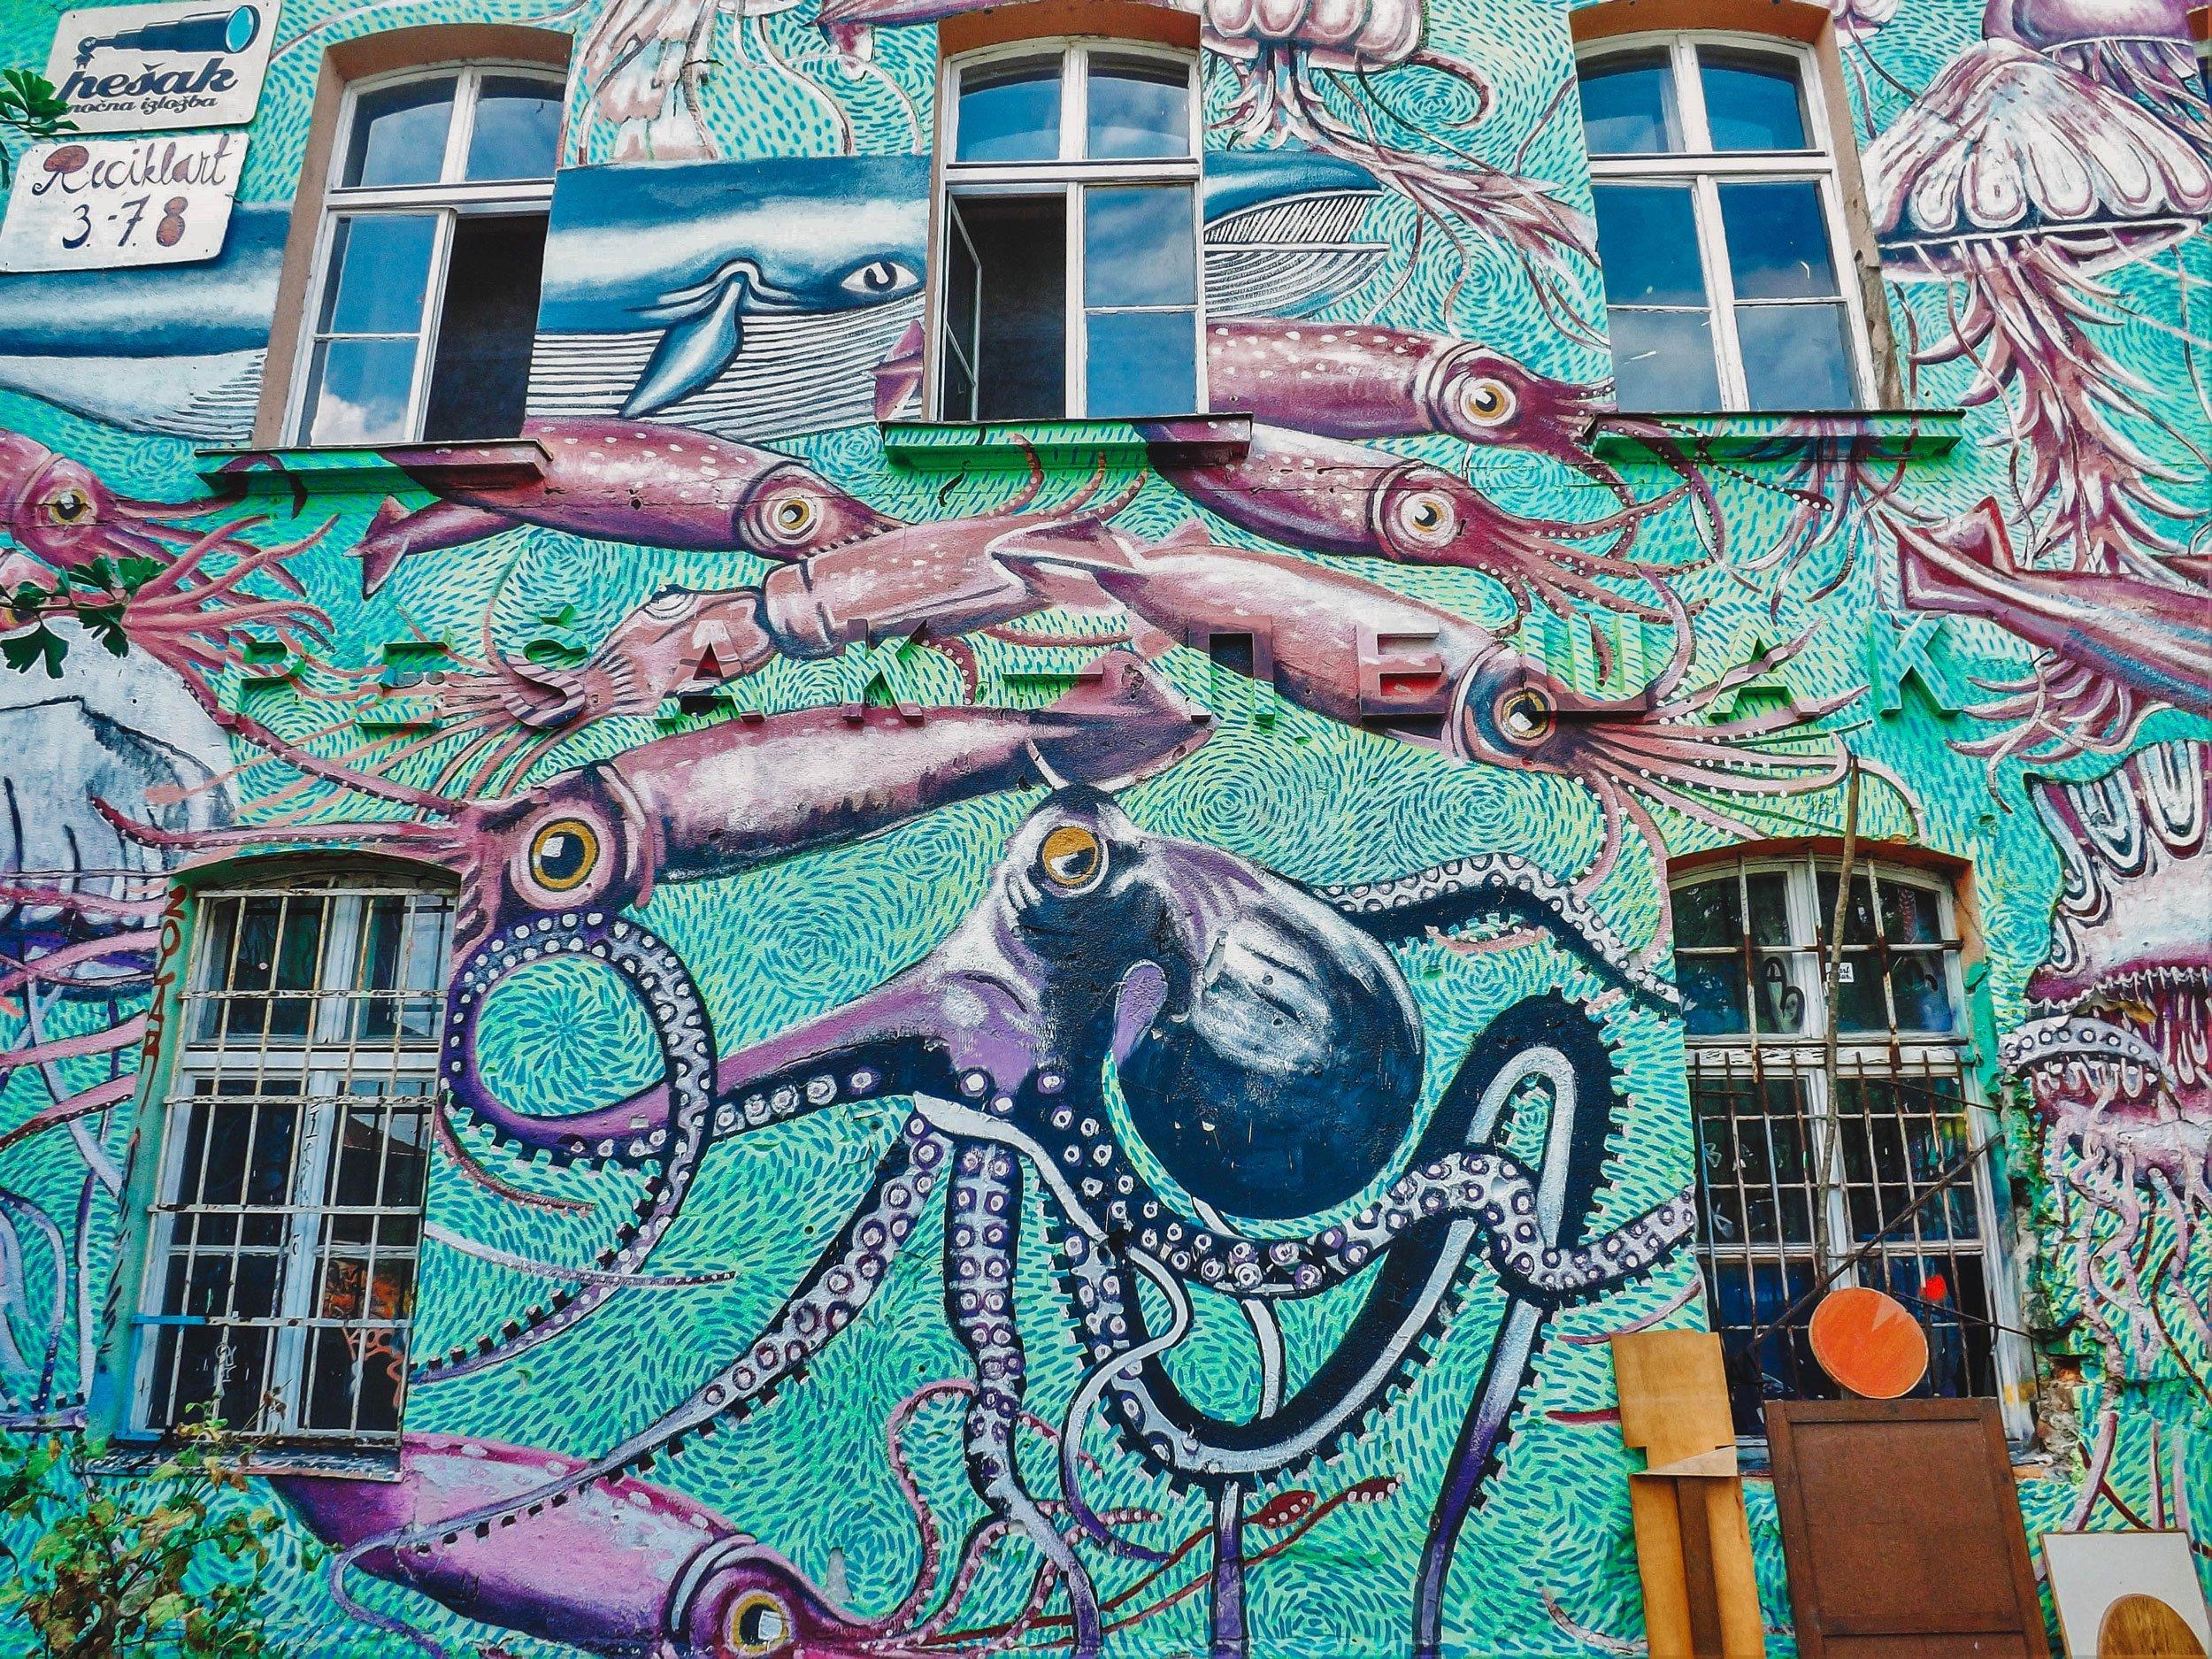 squid mural Metelkova Mesto Ljubljana Slovenia | Best Street Art Cities